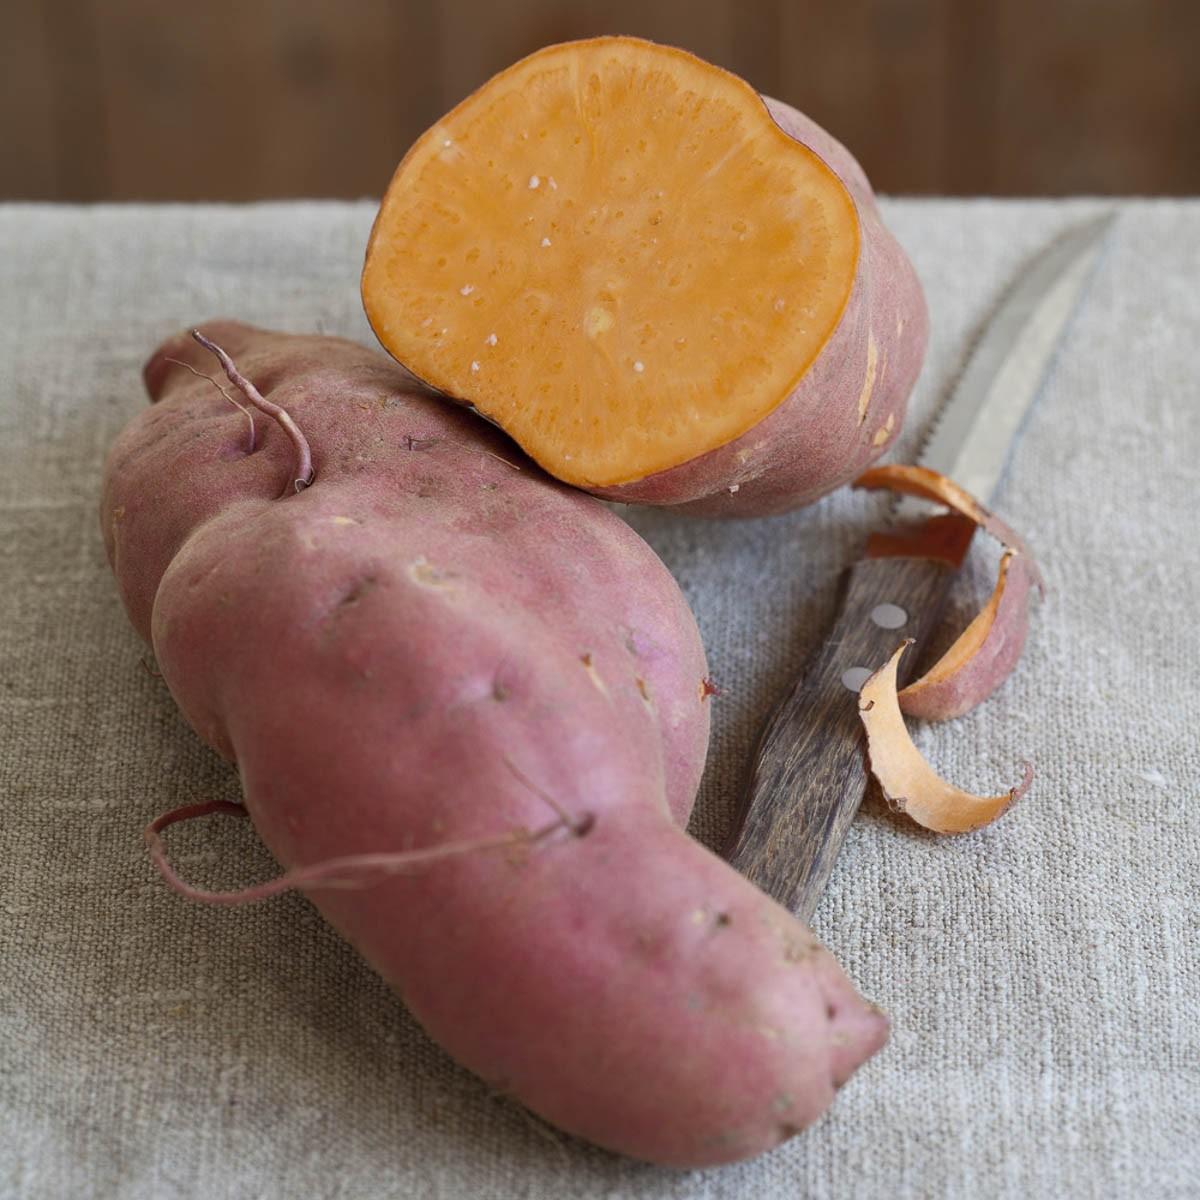 Speise-Süßkartoffel 'Erato® Orange'